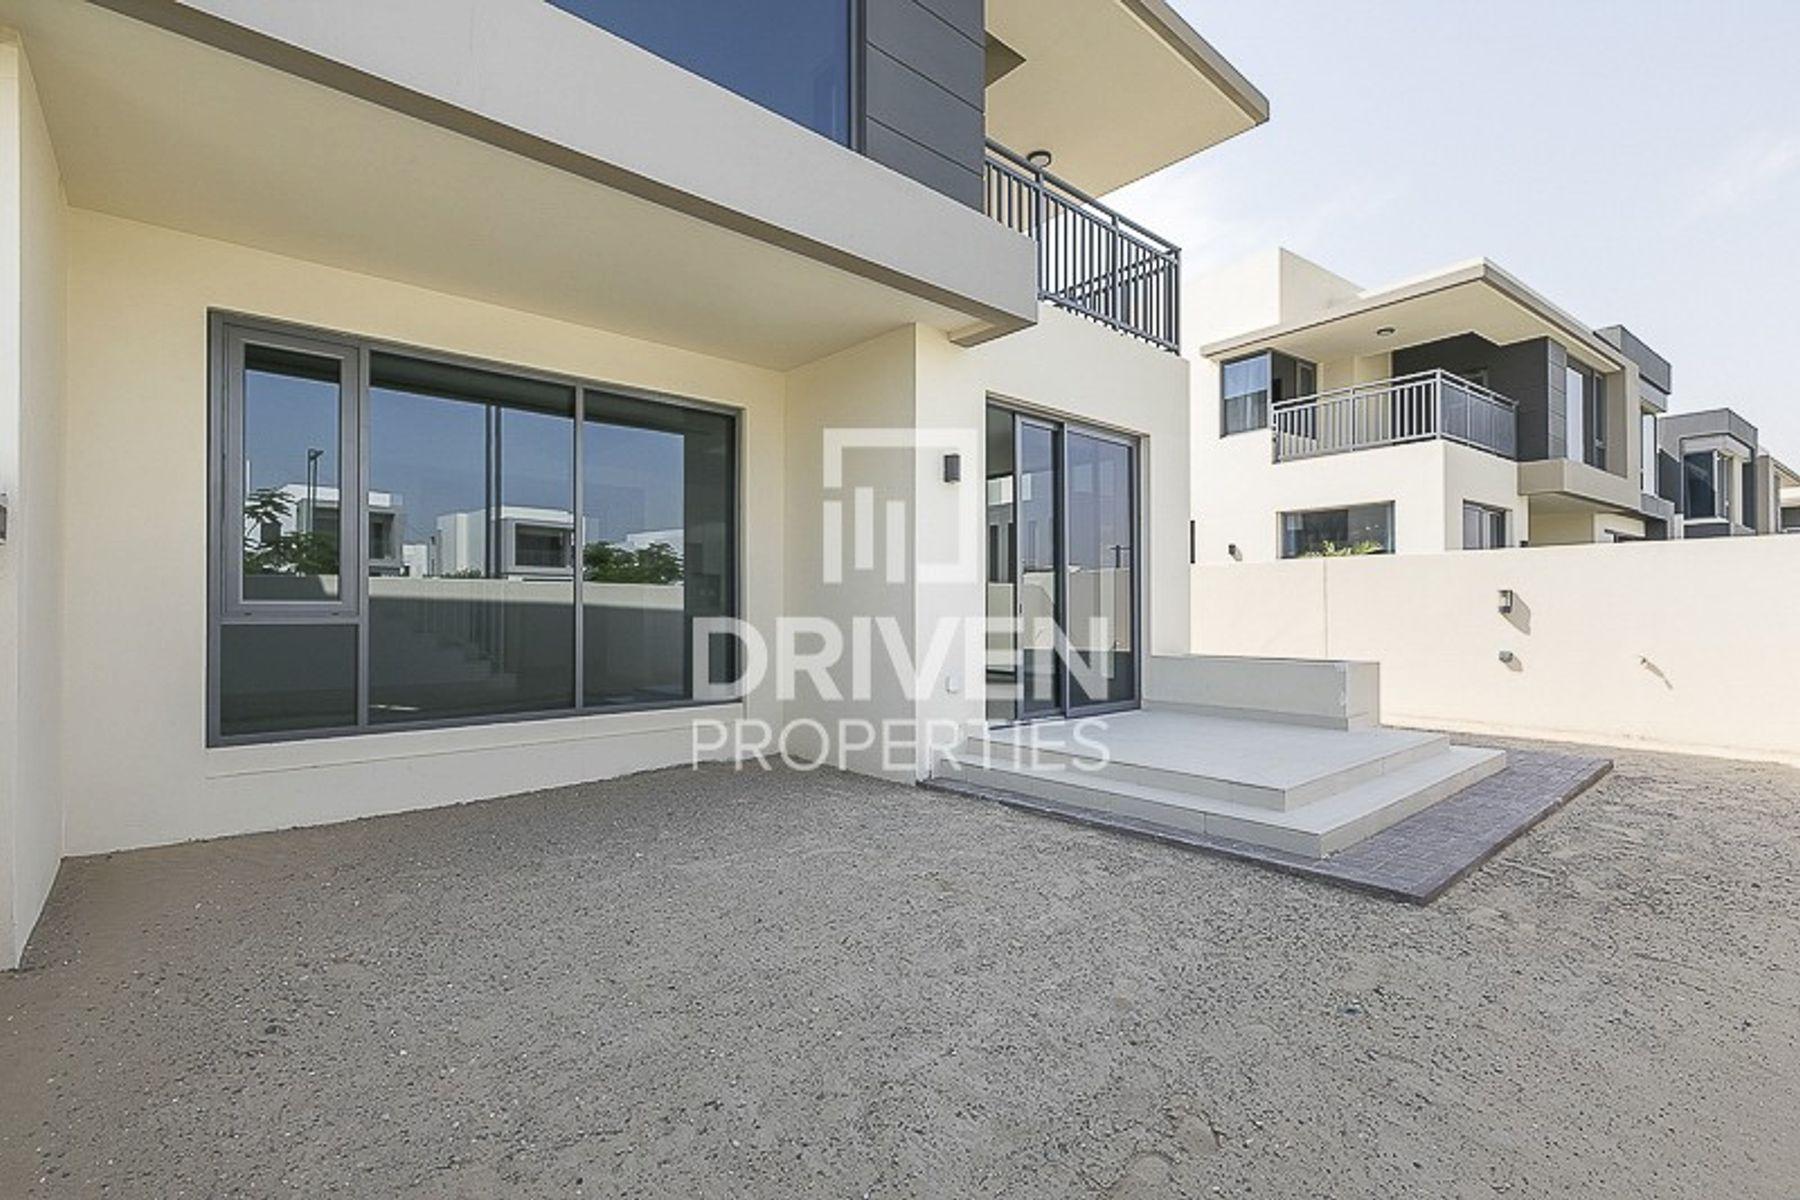 Townhouse for Sale in Maple 1 - Dubai Hills Estate